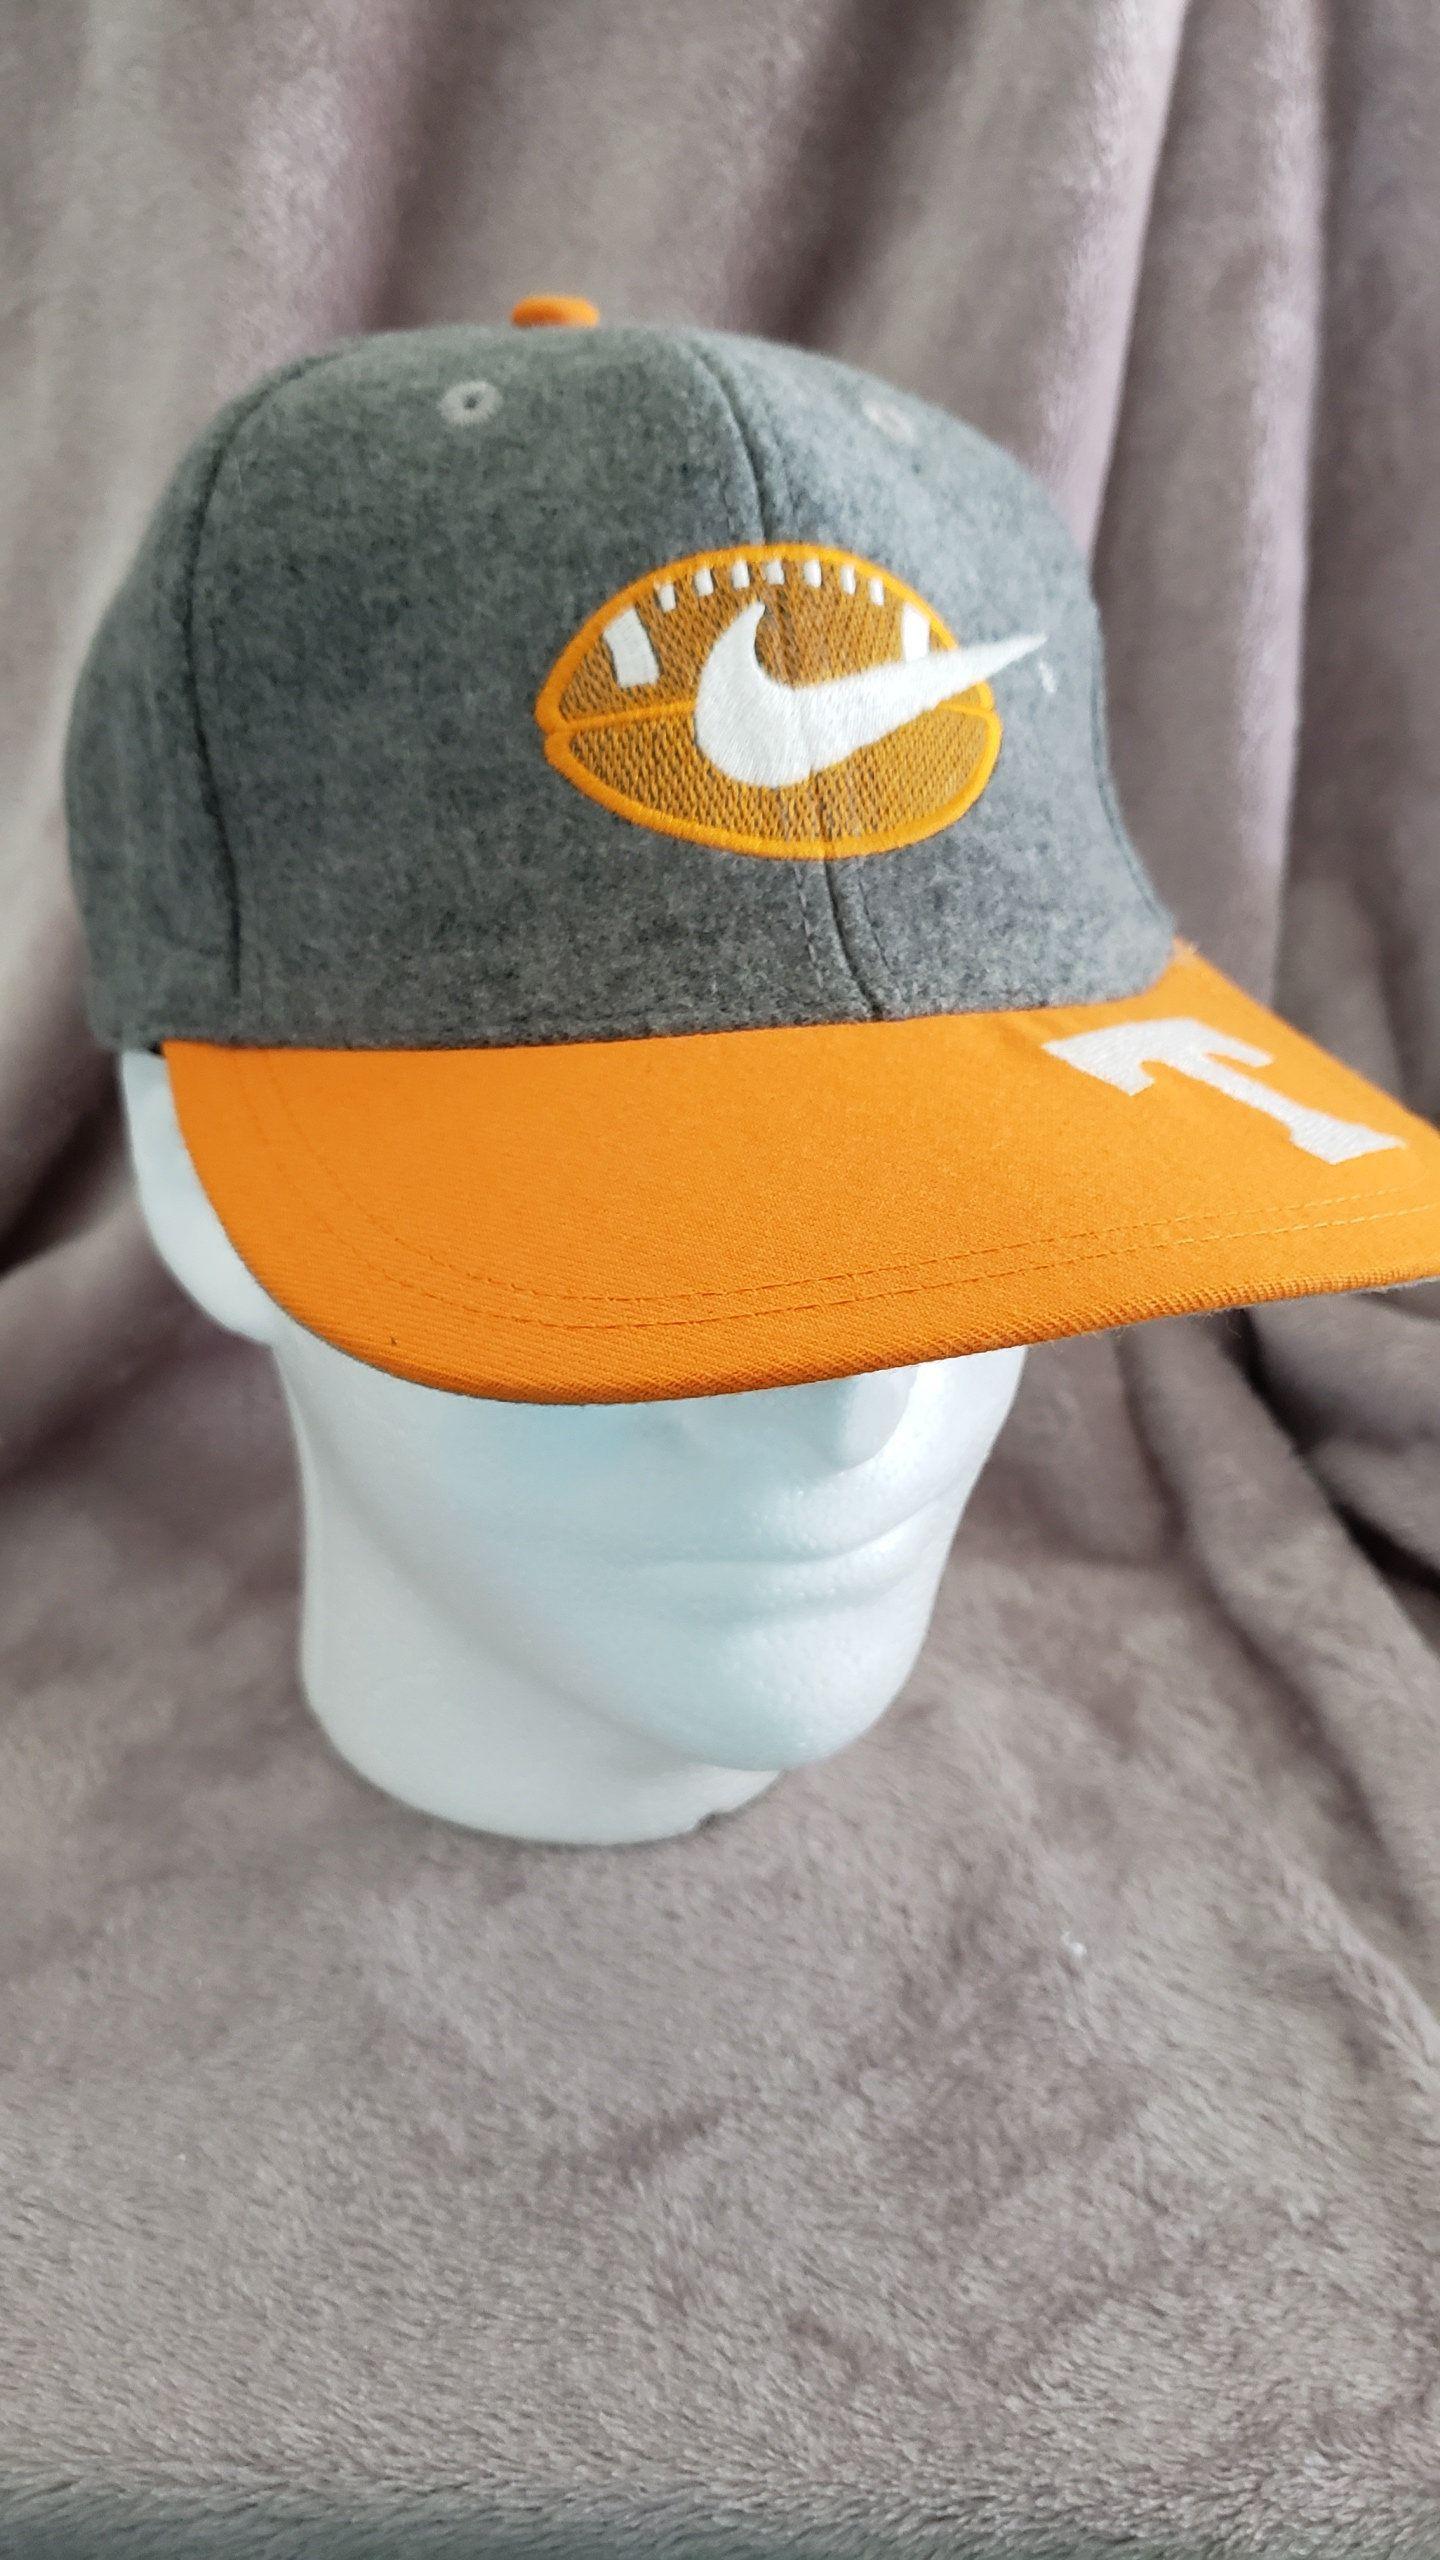 Vintage 90 s Nike White Tag Tennessee Volunteers Football Snapback Hat Cap  Fashion Hype Urban Hip Hop Old School Throwback Gear by RackRaidersVtg on  Etsy 7e4f84c3e29